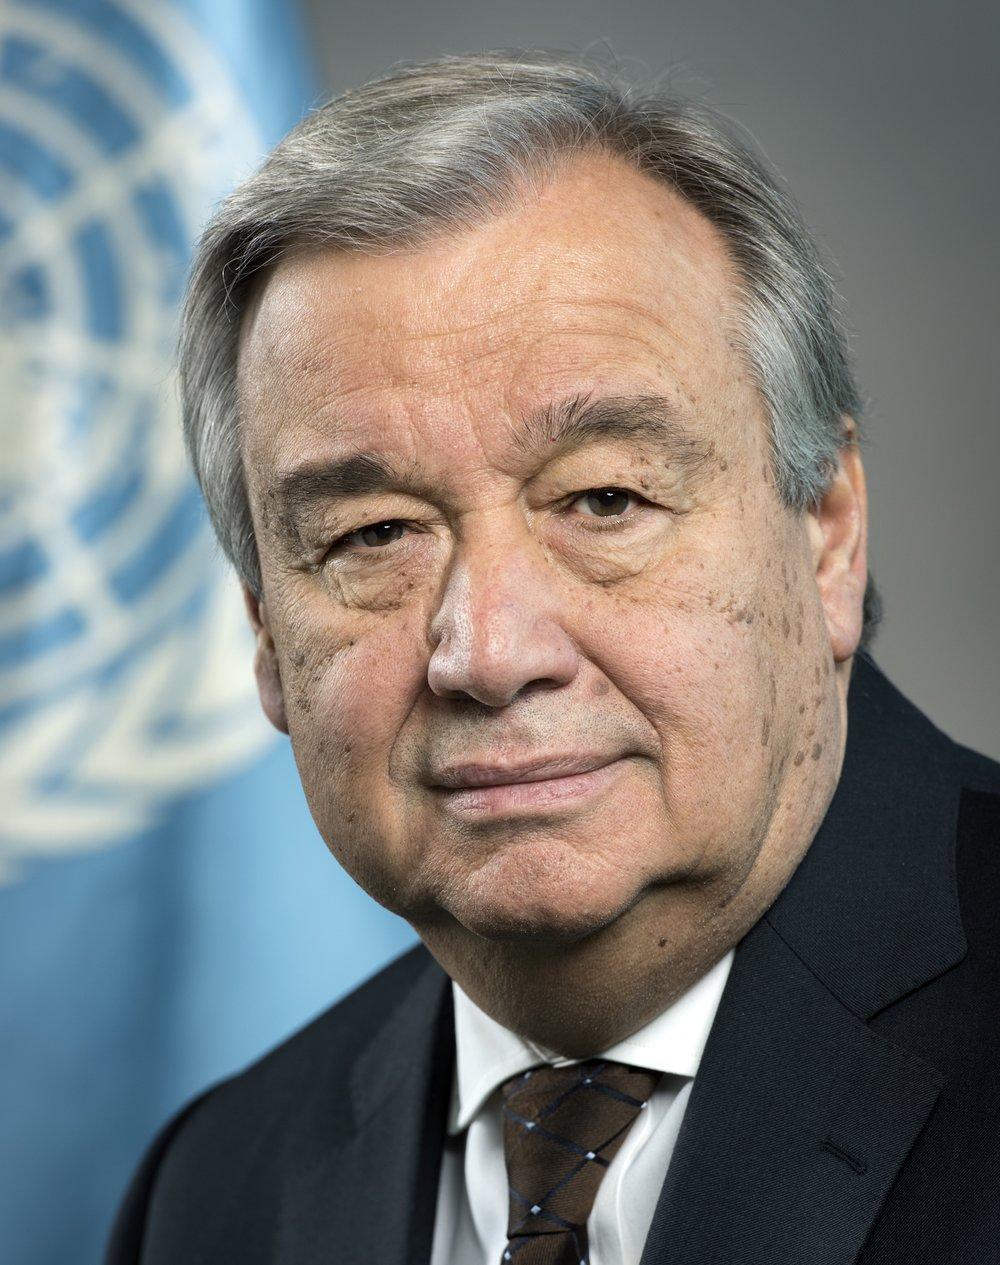 United Nations Secretary-General António Guterres. Credit:U.N. Photo/Mark Garten.